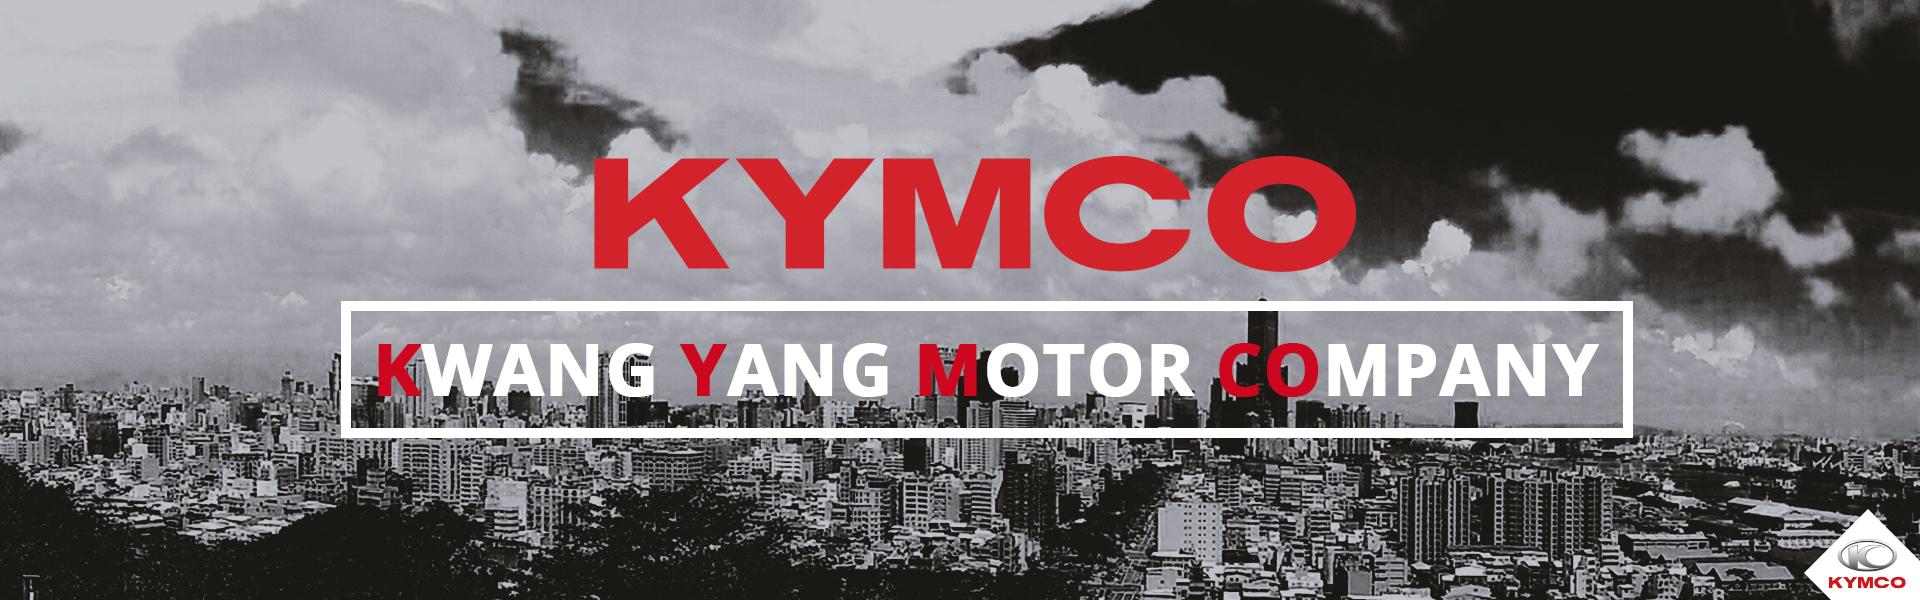 Histoire-kymco